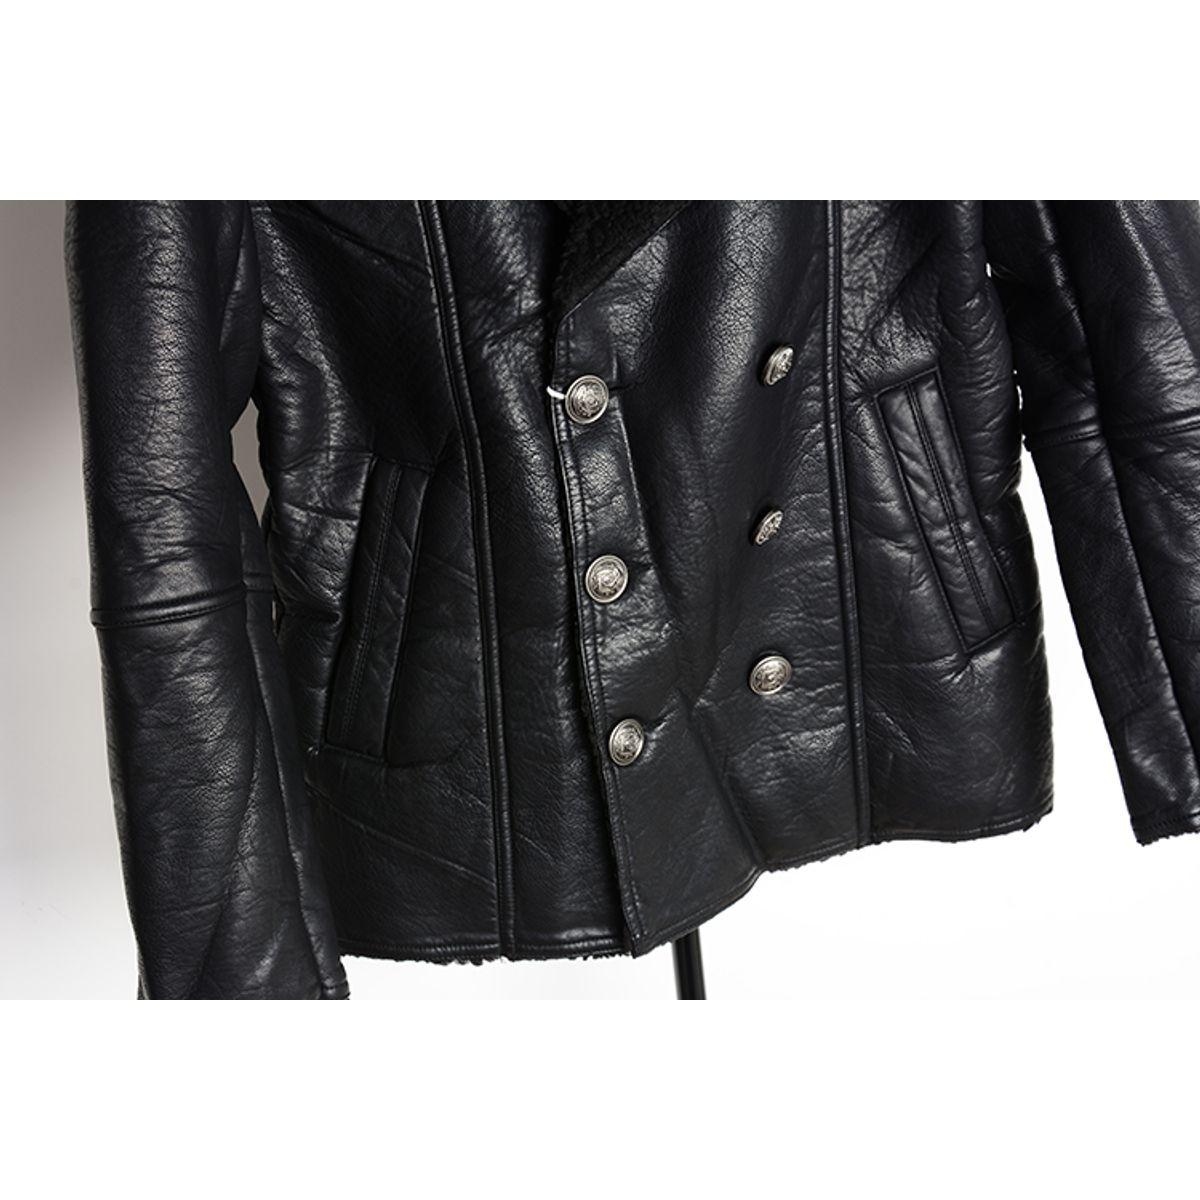 T20 - Italiano TUCCI Vintage Slim Fit Padding Style Designer Mens Pure Leather Jacket